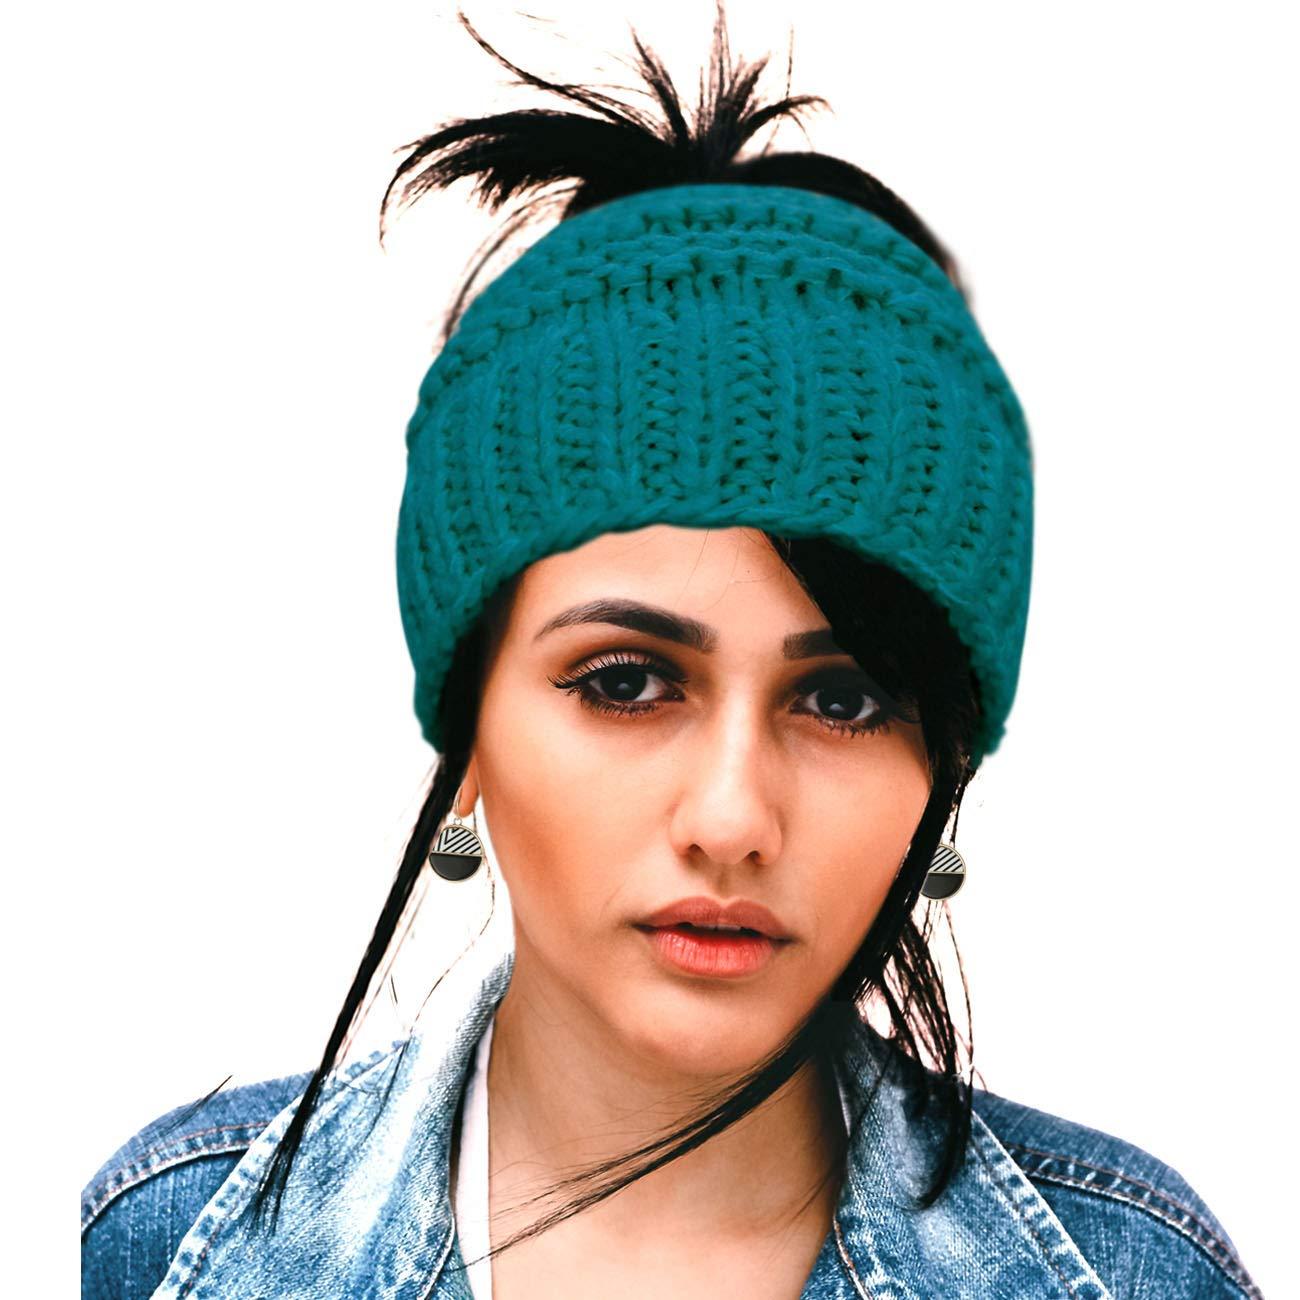 907e6415a Women's Ponytail Beanies Messy Bun Winter Crochet Knit Beanie Hats  BeanieTail with Ponytail Bun Hole for Women Girls Blue Teal - Cool Beanie  Hats